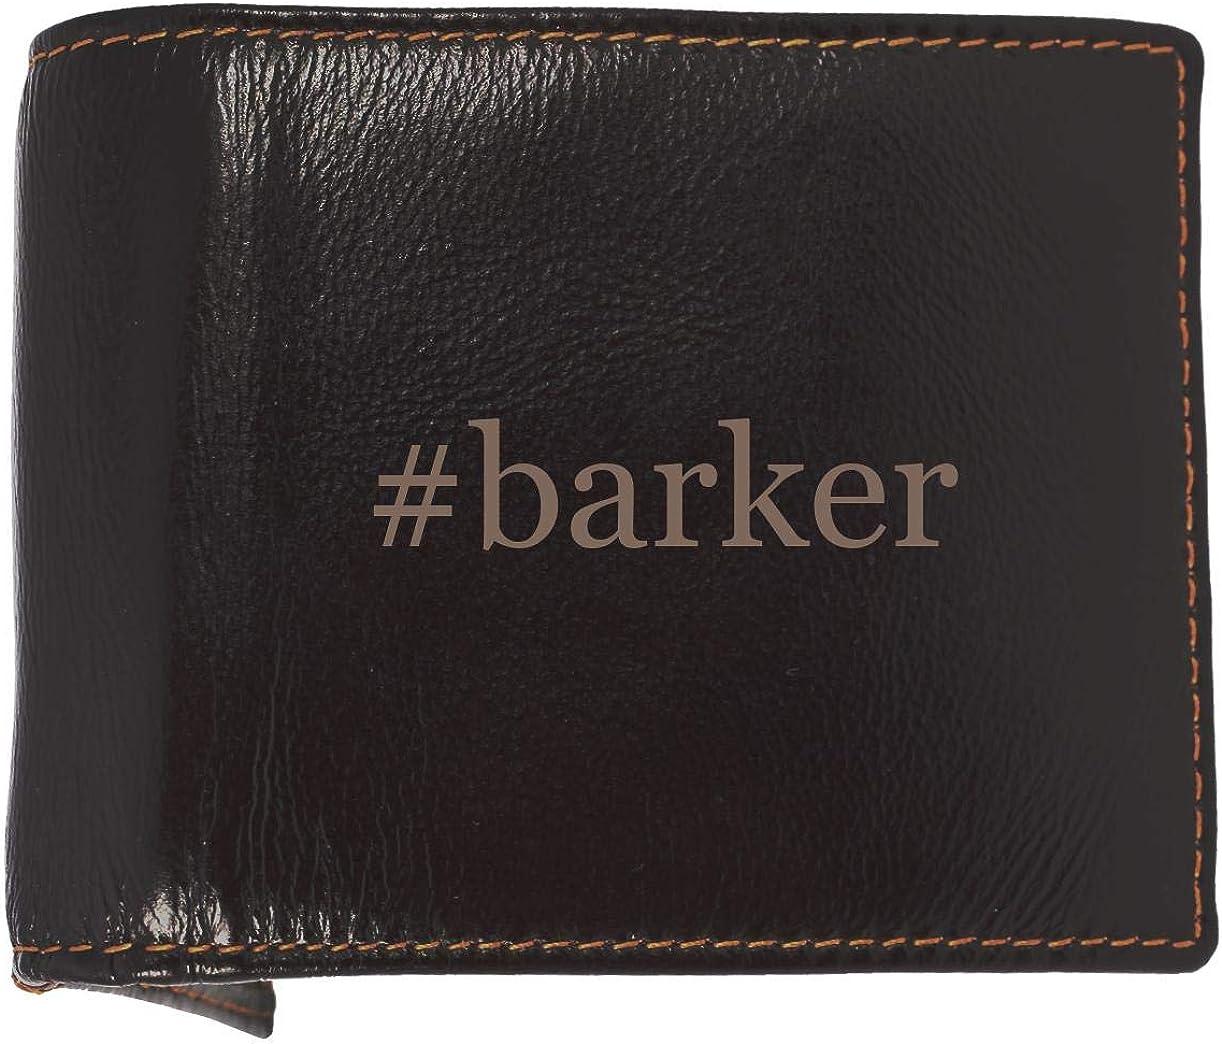 #barker - Soft Hashtag Cowhide Genuine Engraved Bifold Leather Wallet